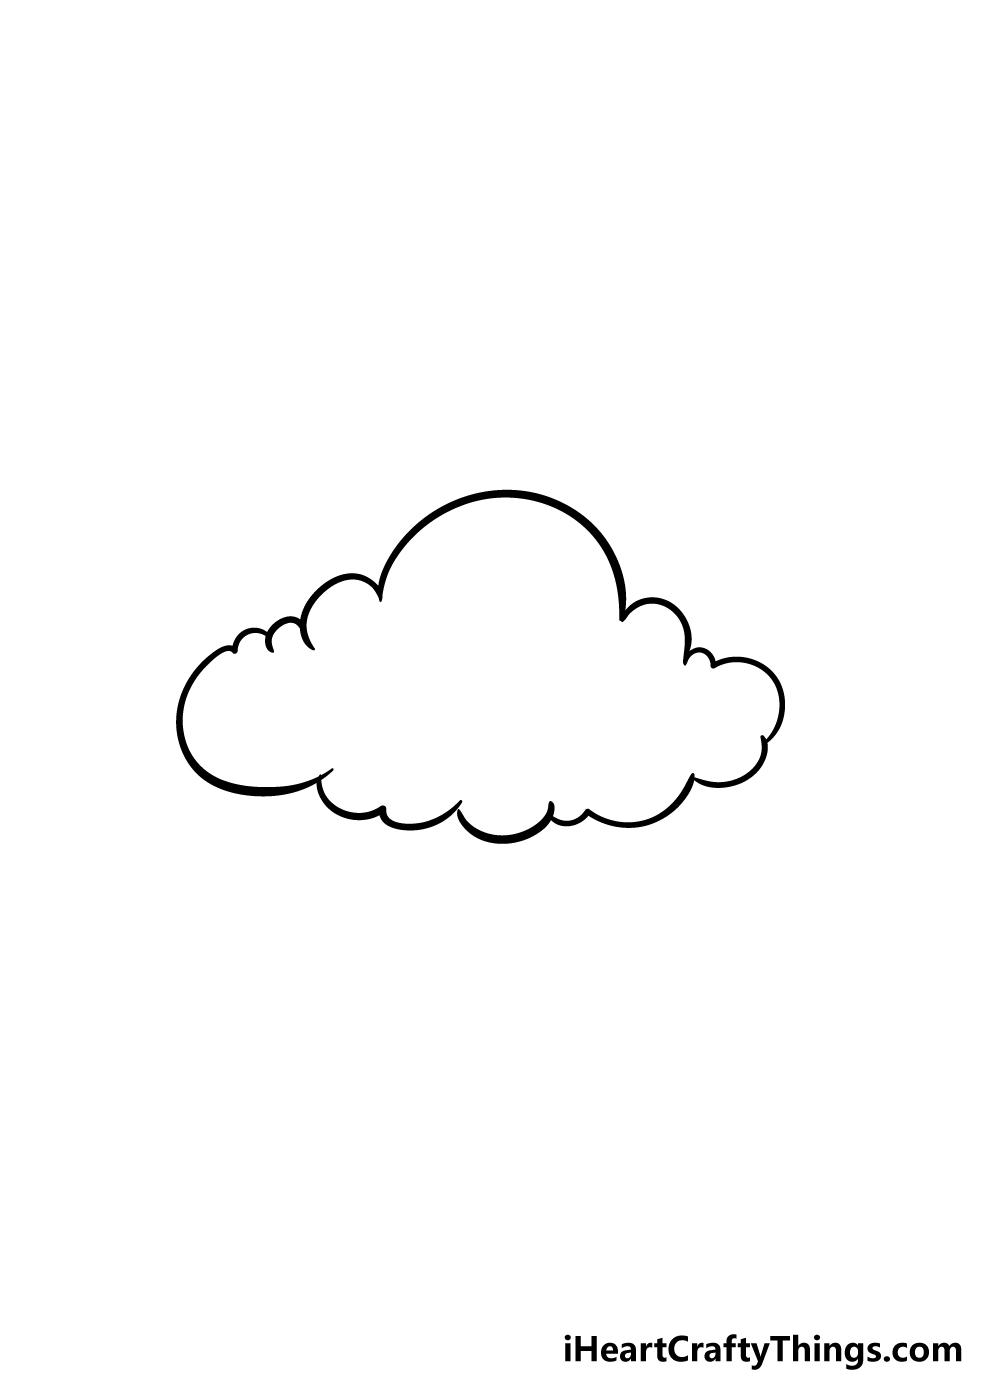 cloud drawing step 4